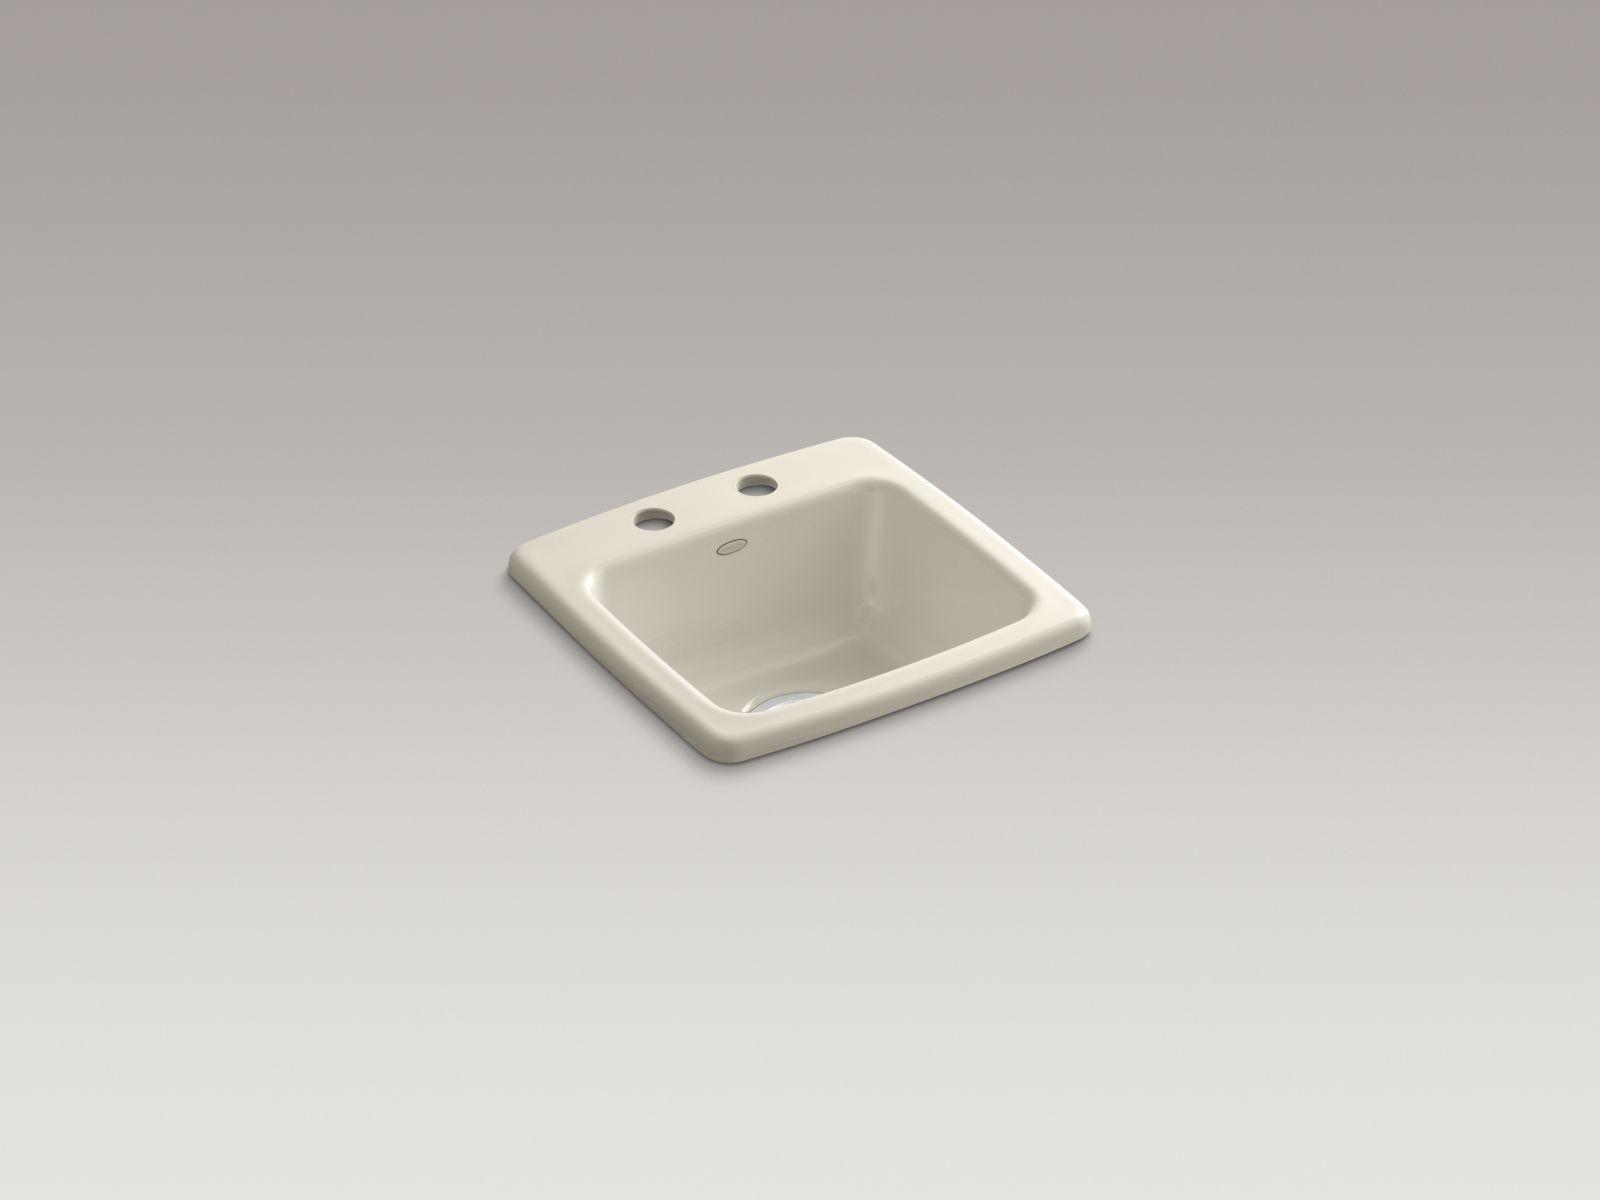 Kohler K-6015-2-47 Gimlet Self-rimming Single-bowl Bar Sink with 2 Faucet Holes Almond